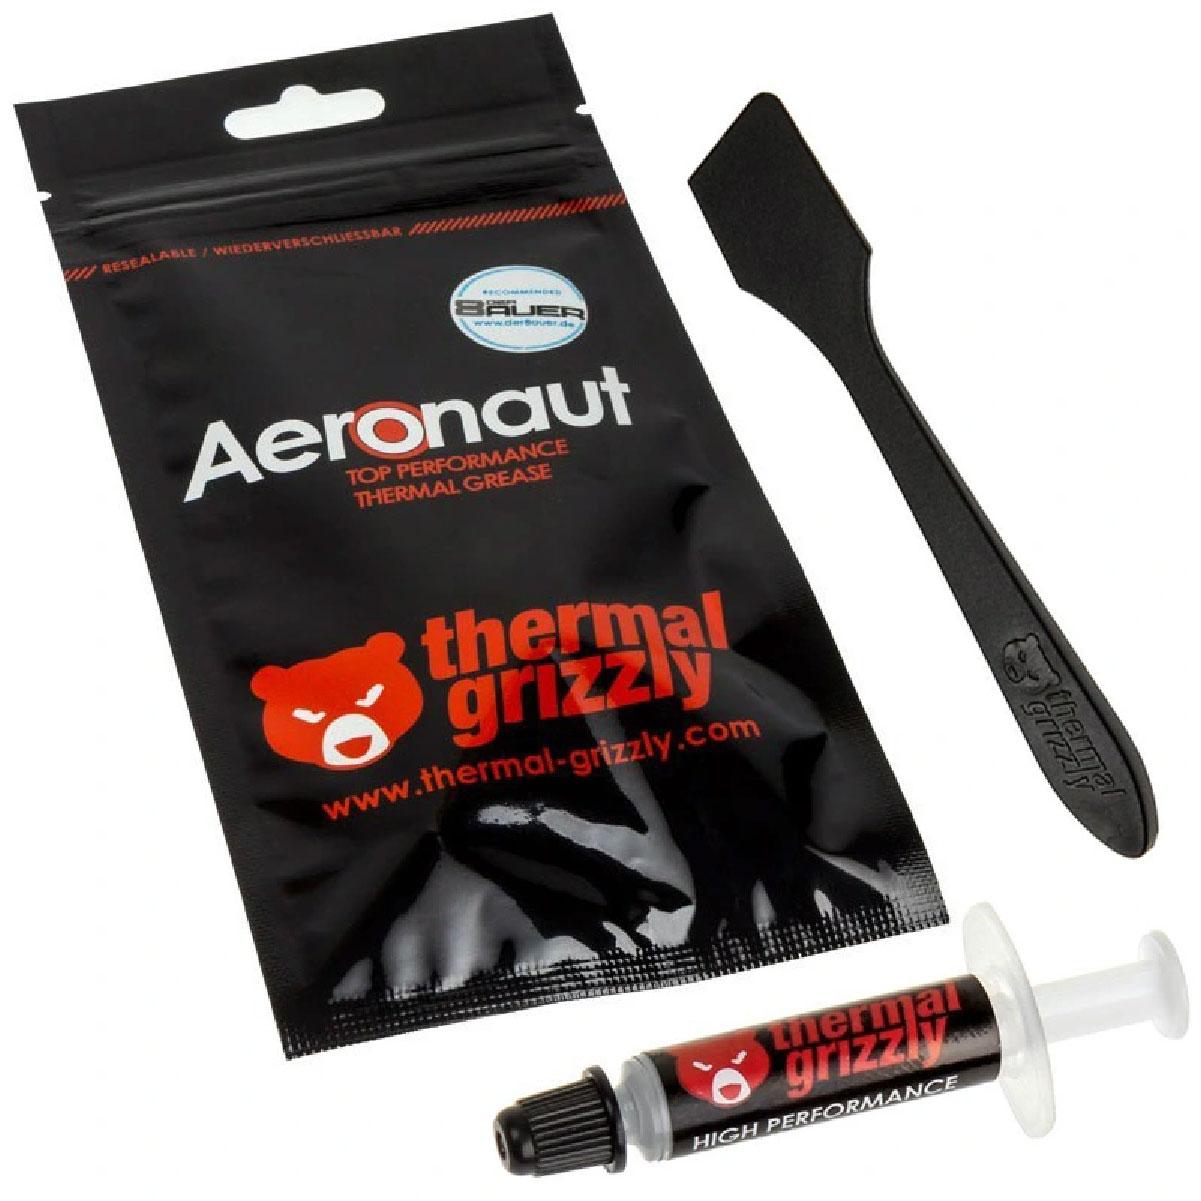 Pasta Térmica Aeronaut 1g Thermal Grizzly 8,5 Wmk com Espatula Overclock